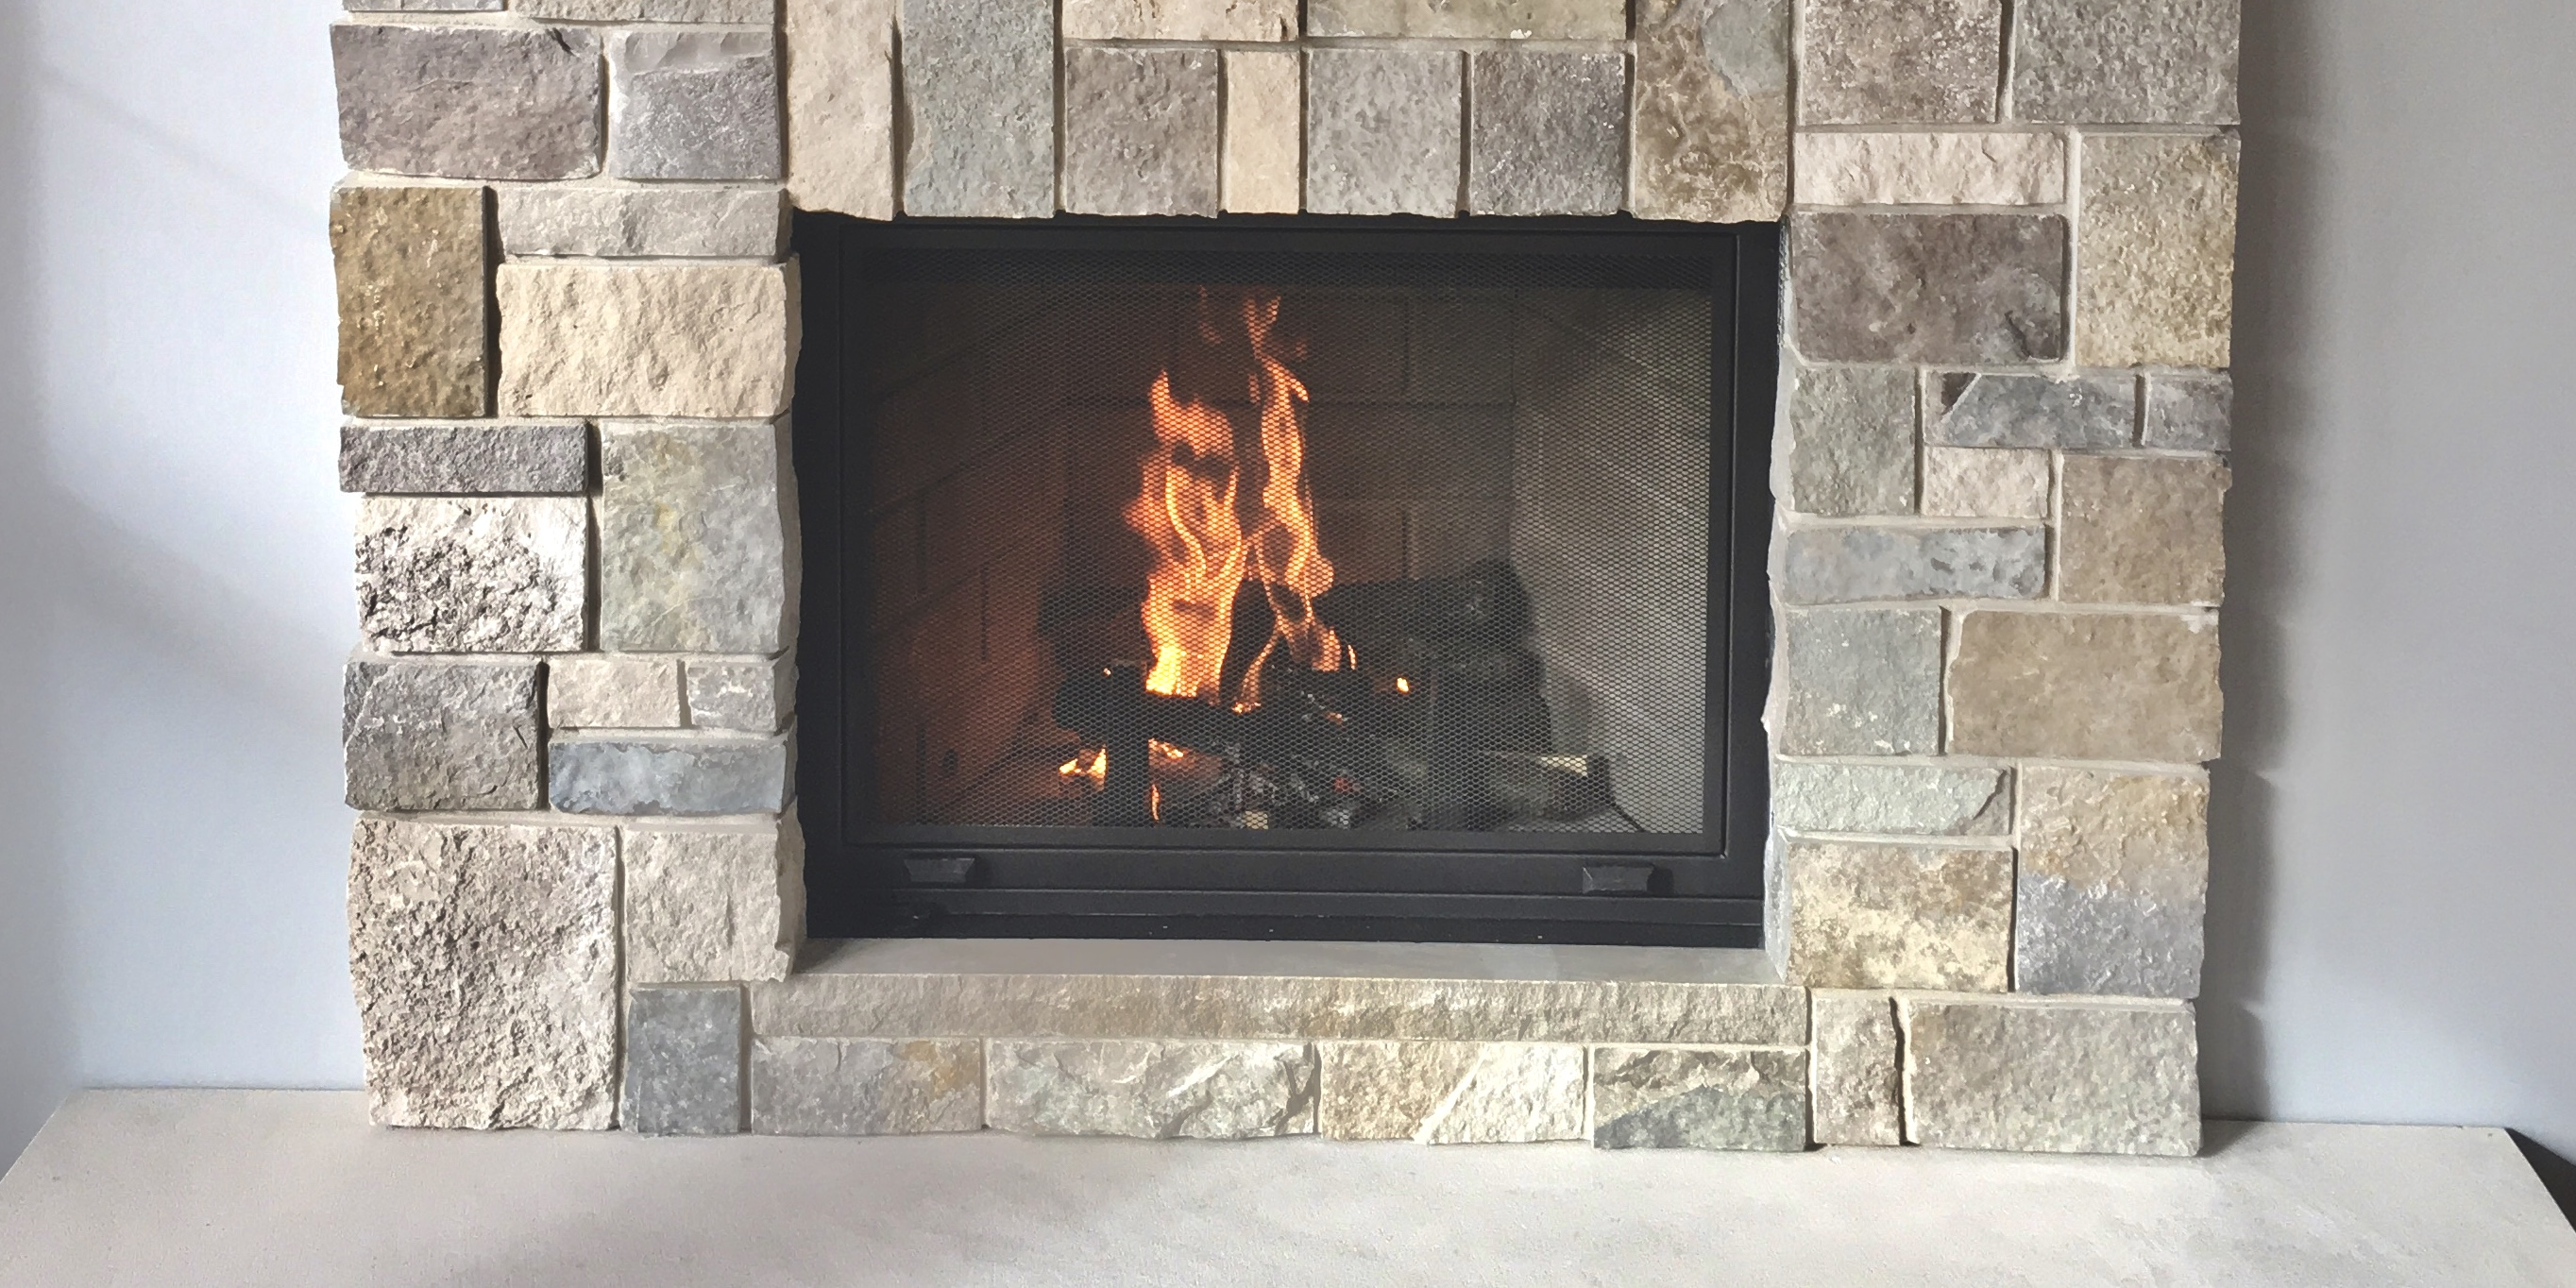 wood fireplaces builder s fireplace company rh buildersfireplace com best high efficiency wood burning fireplace inserts best high efficiency wood burning fireplace inserts